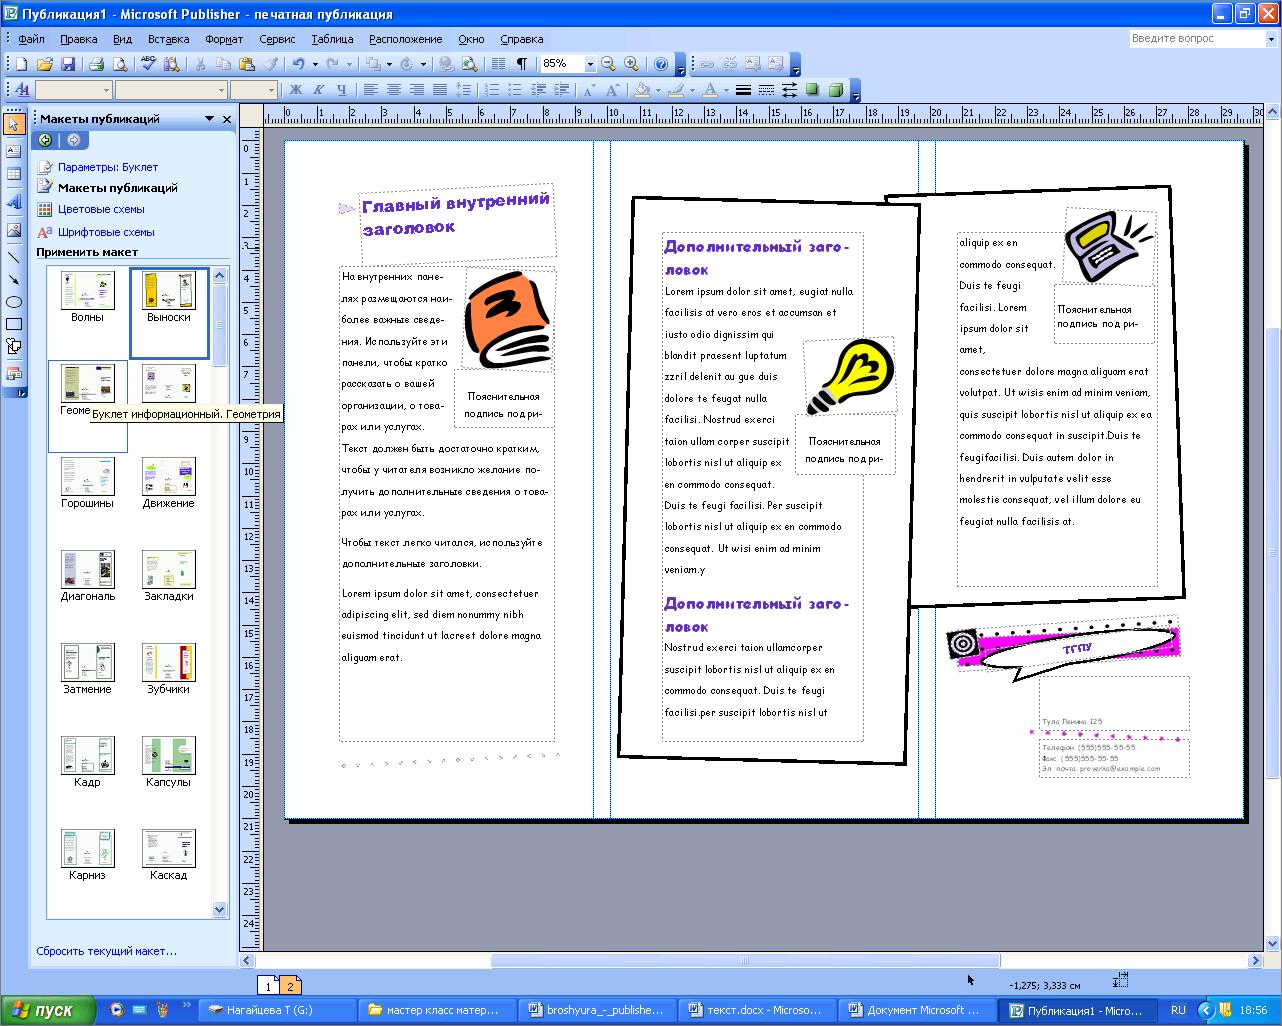 C:\Users\Андрей\Desktop\7.png